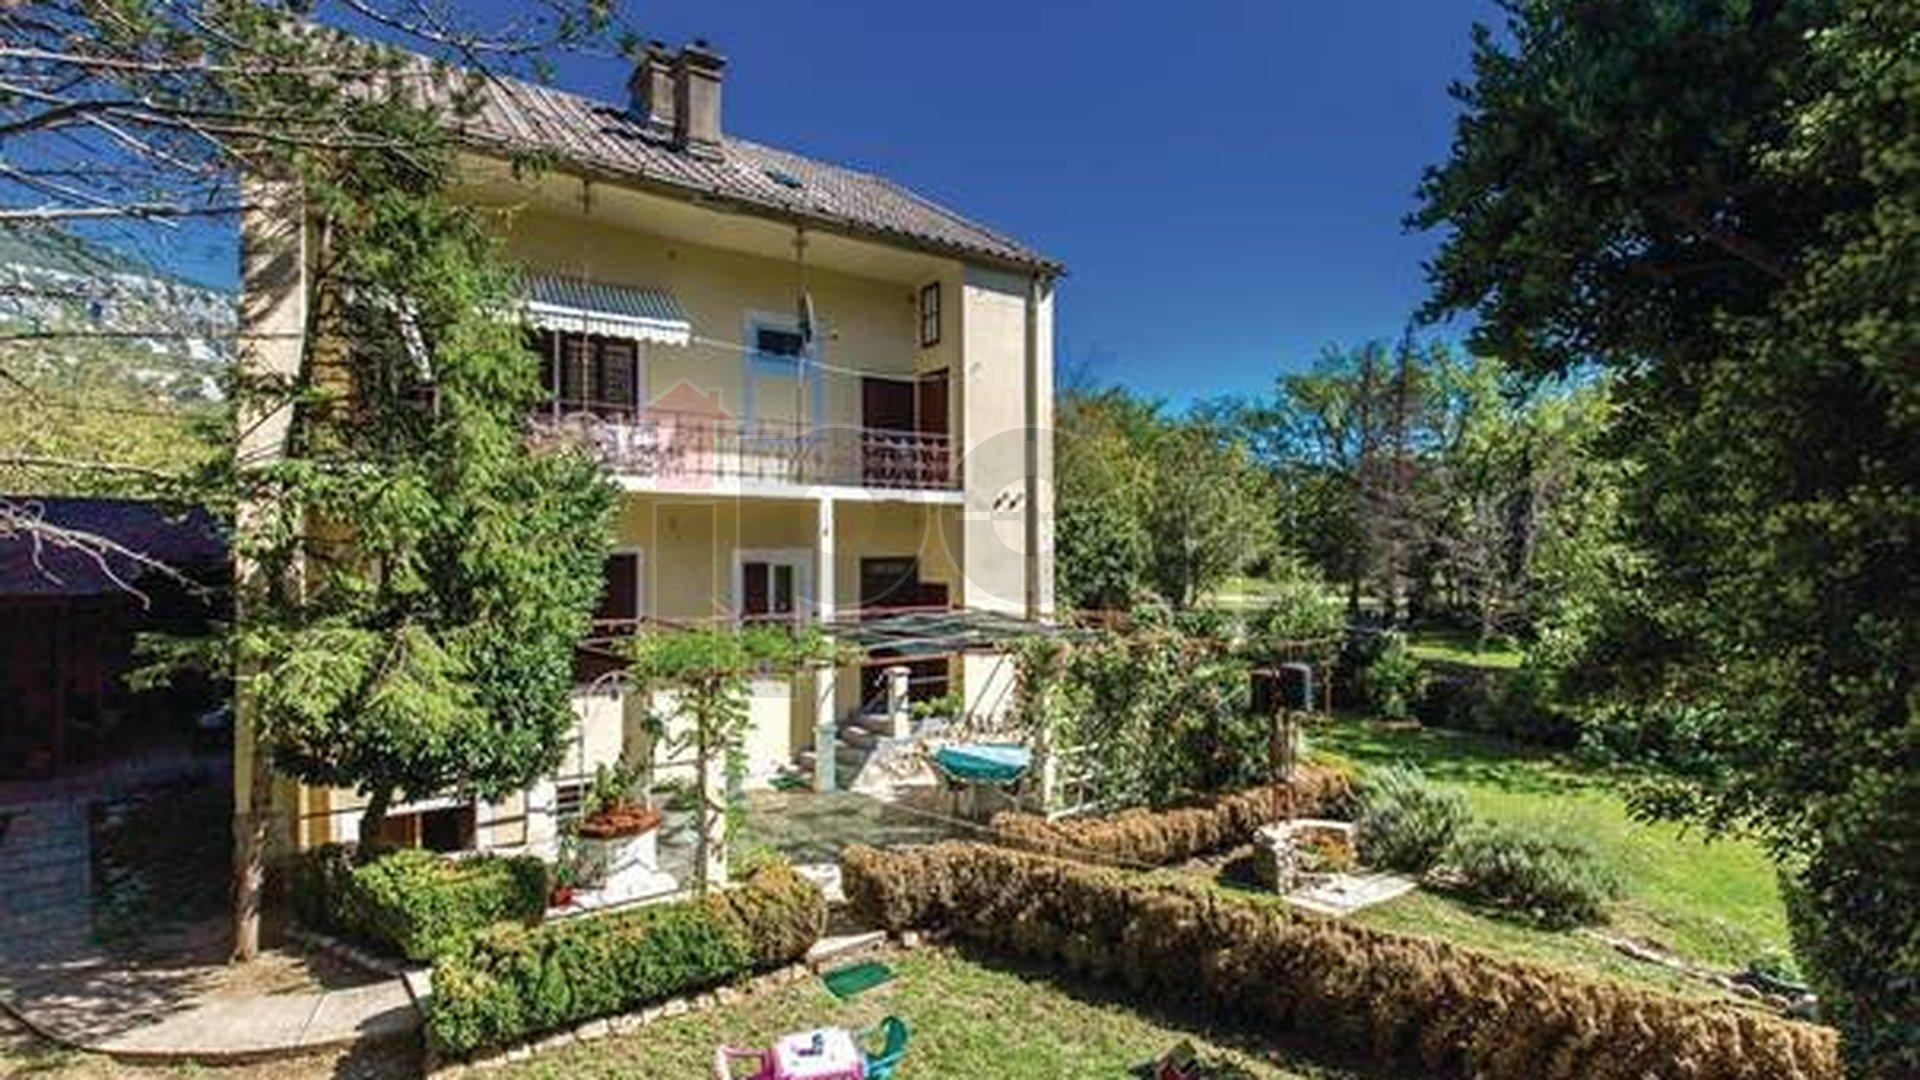 Casa, 320 m2, Vendita, Crikvenica